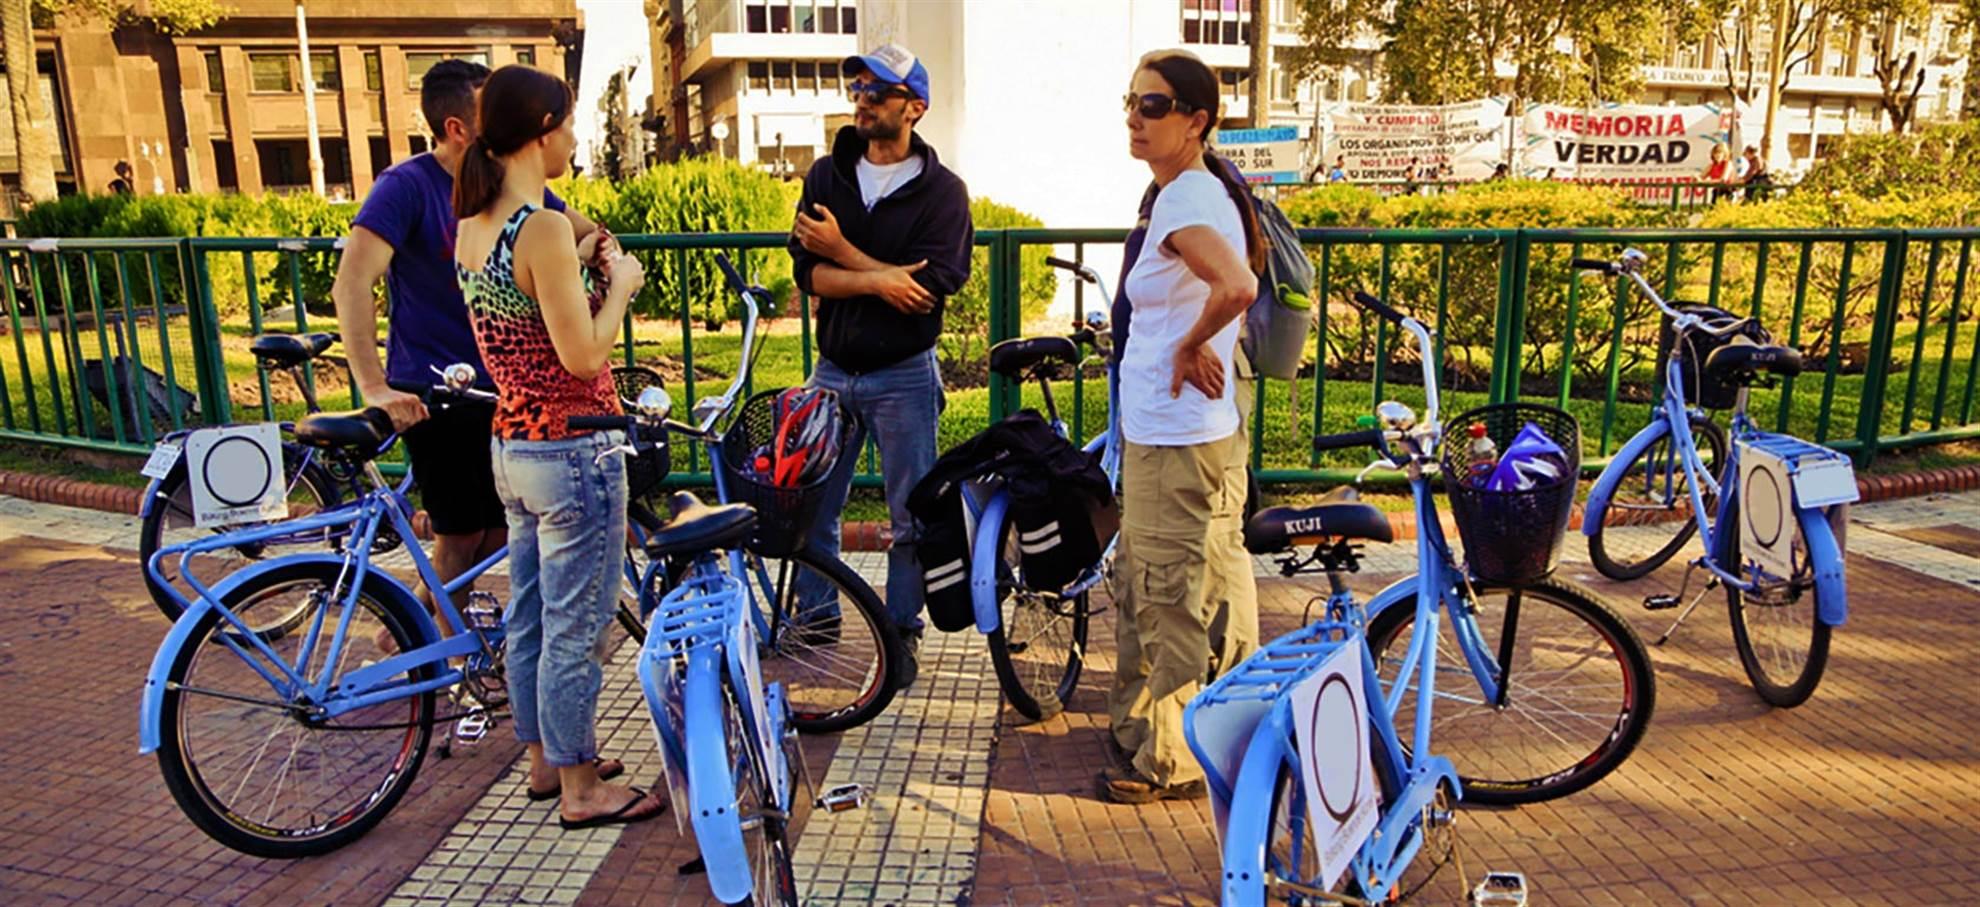 Sevilla highlights fietstour